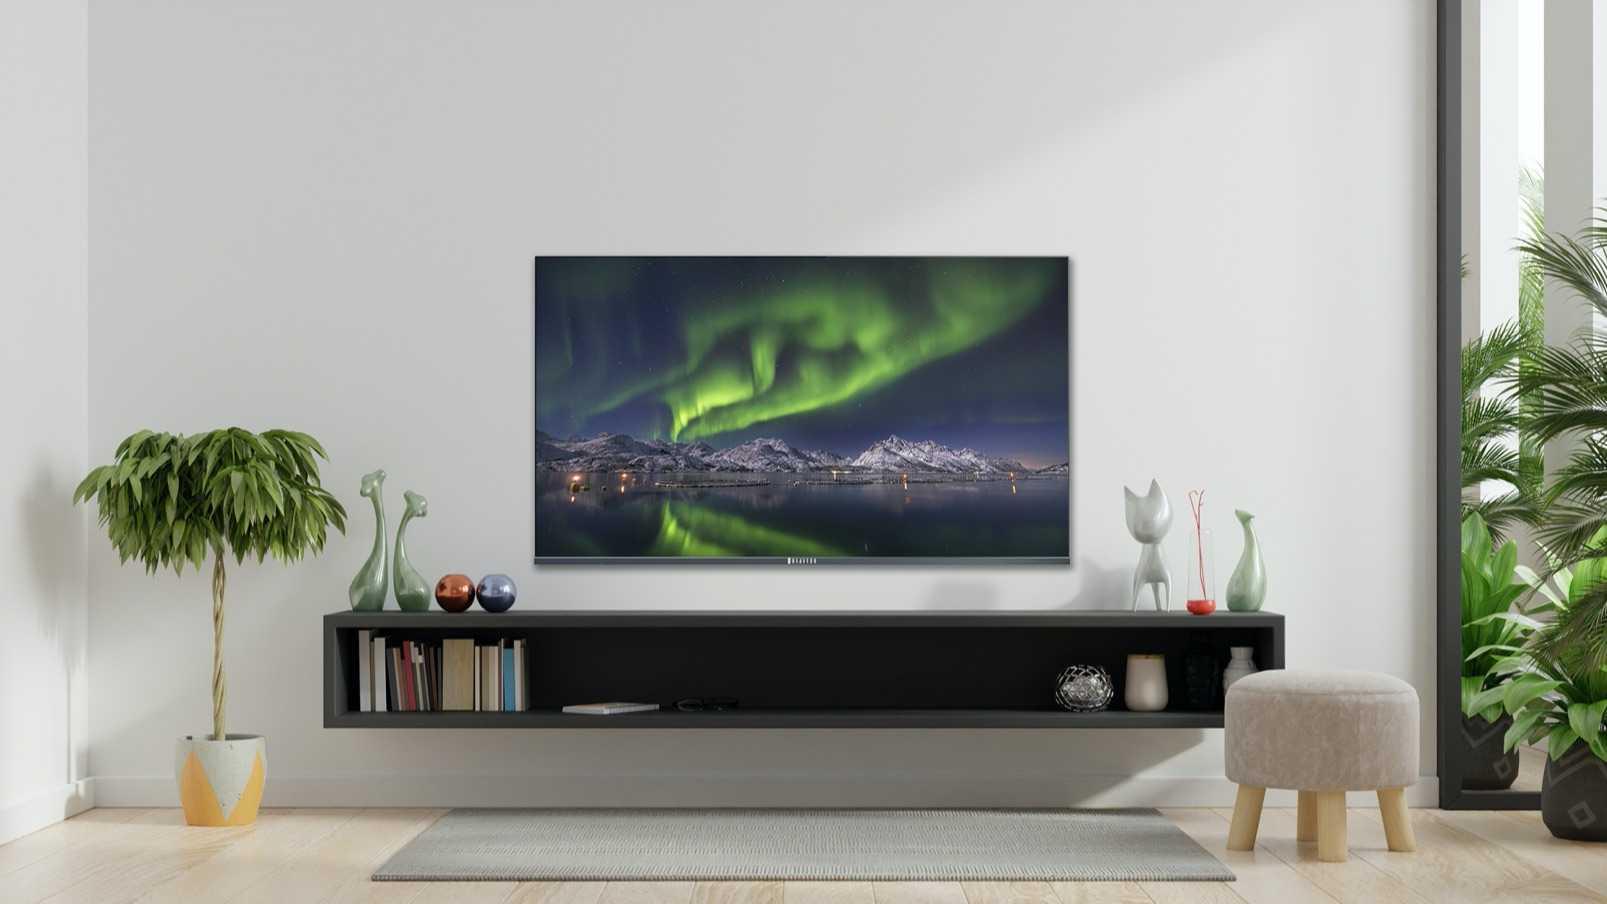 "Dijitsu'dan 65"" 4K Android TV Deneyimi"